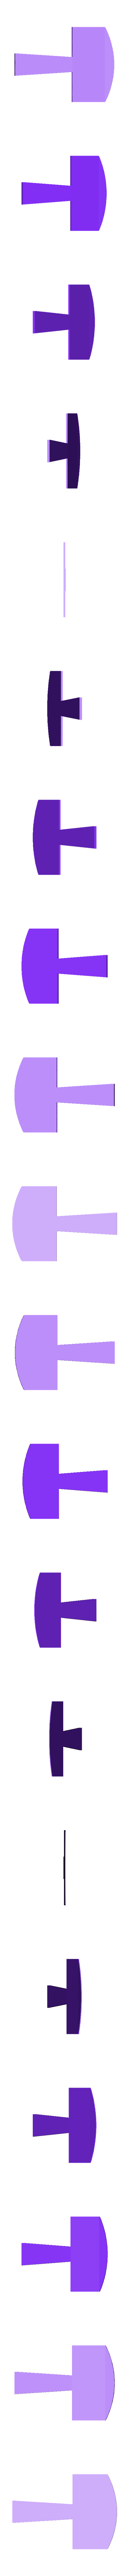 bucket_scraper.stl Download free STL file Bucket Scraper • 3D printable object, DraftingJake